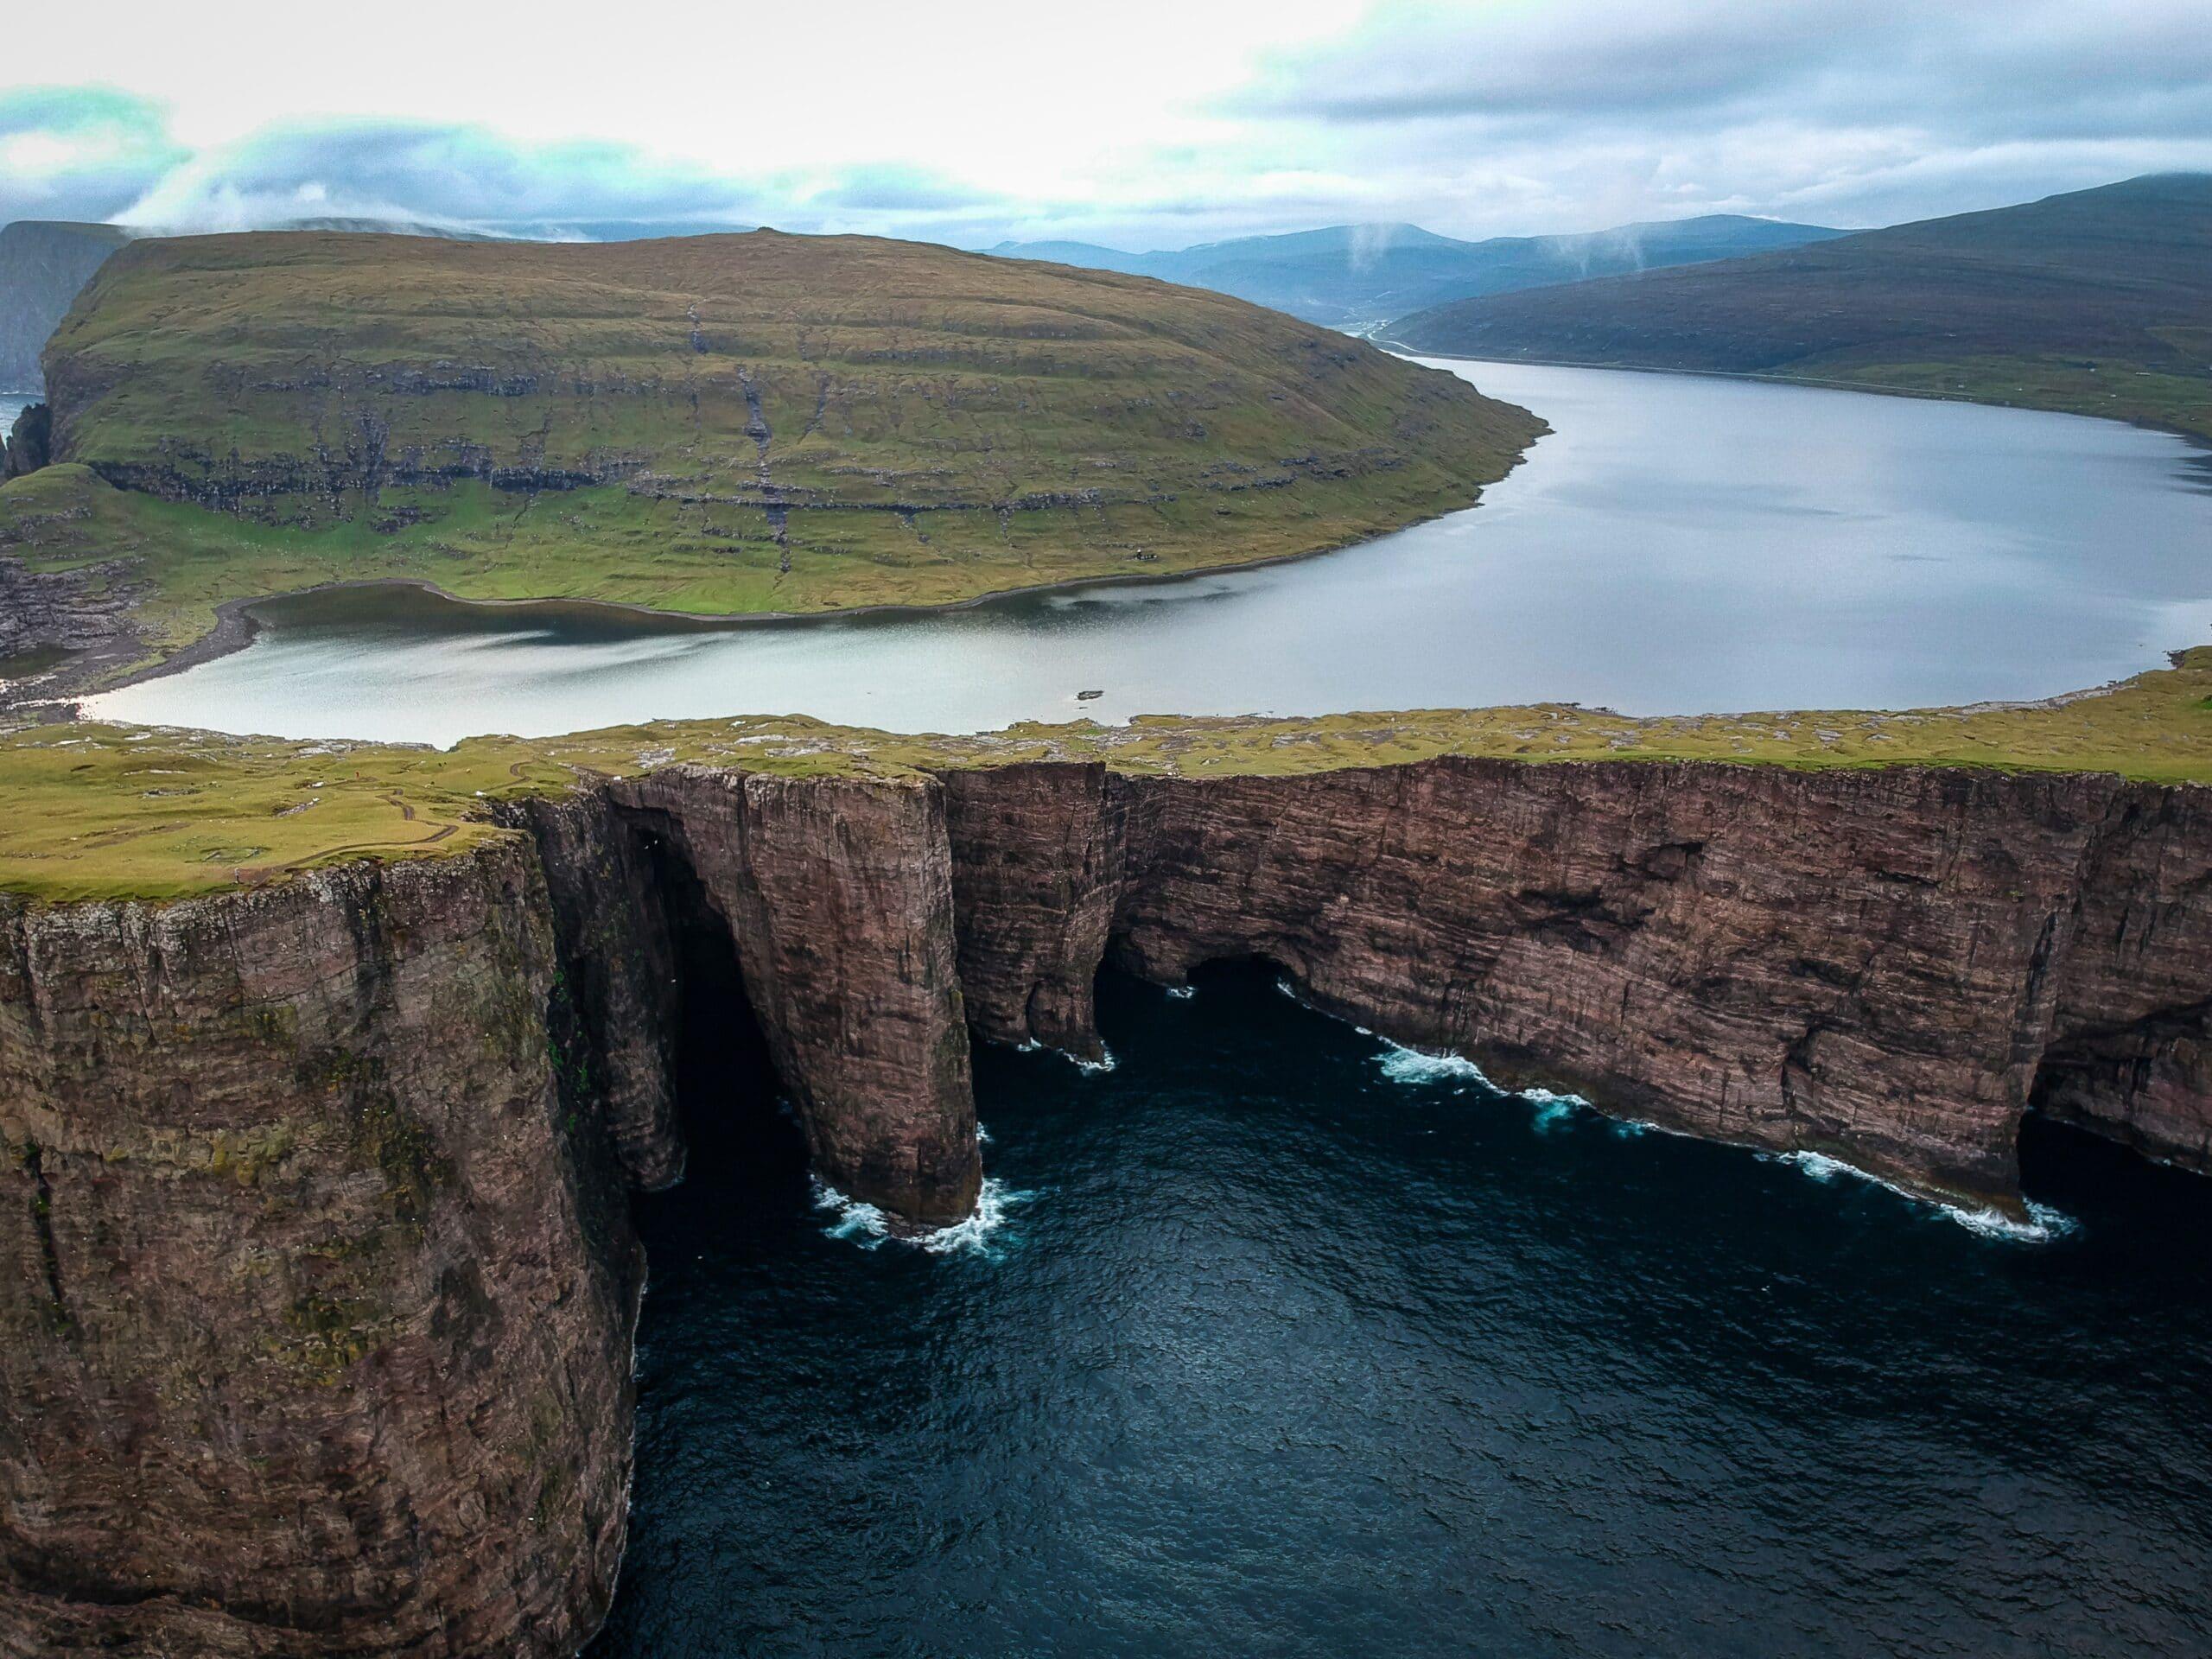 Lake in the Faroe Islands